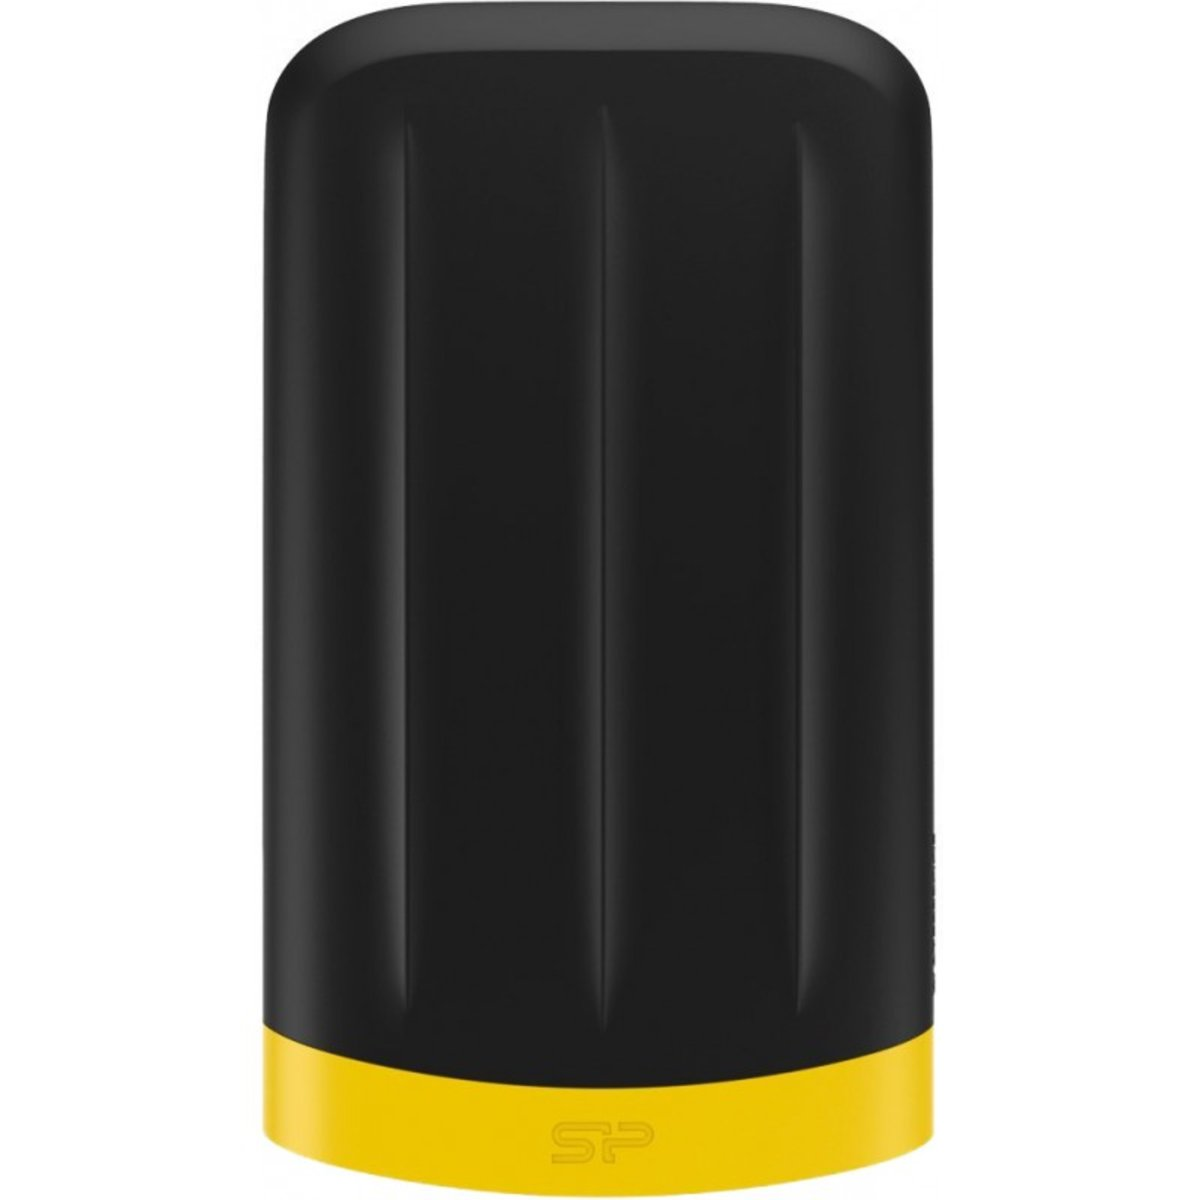 Armor A65 2.5吋 USB 3.0 A65 移動硬碟 黑色 2TB